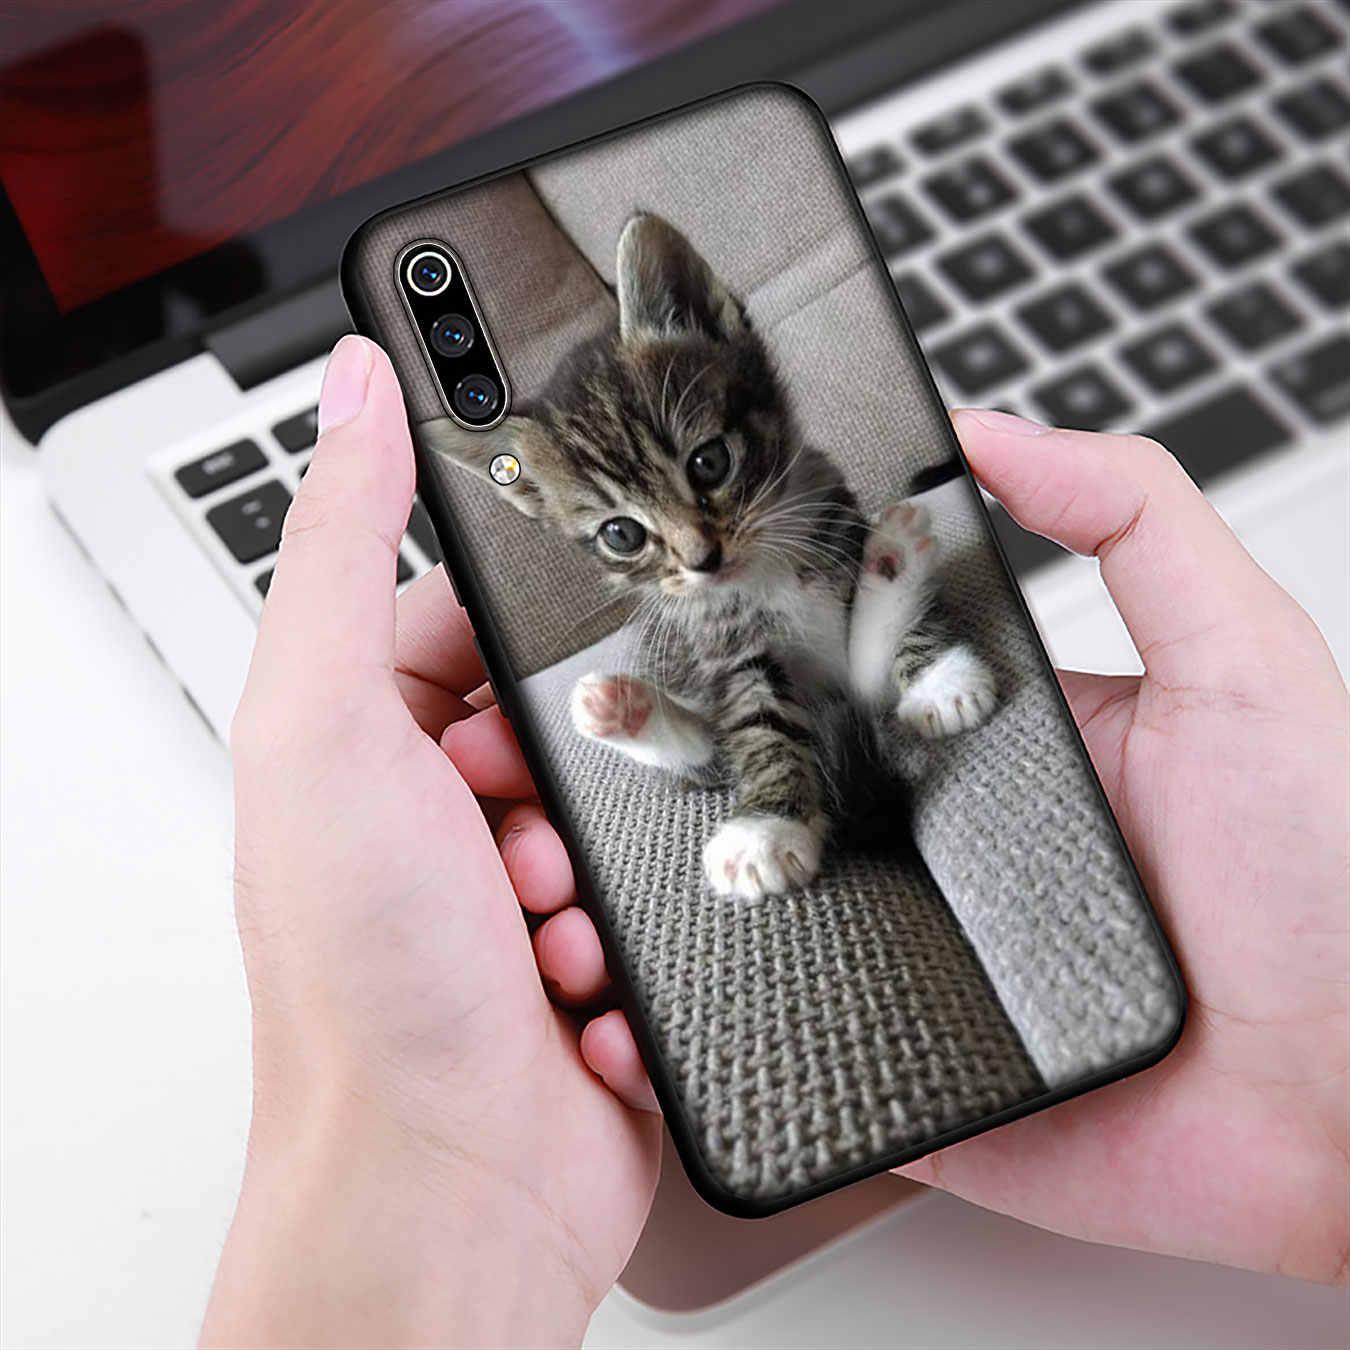 IYICAO lindo gato suave TPU caja del teléfono de silicona para Xiaomi Redmi K20 S2 ir 8A 7A 6A 5A 5 Plus 4X Nota 8 7 6 Pro